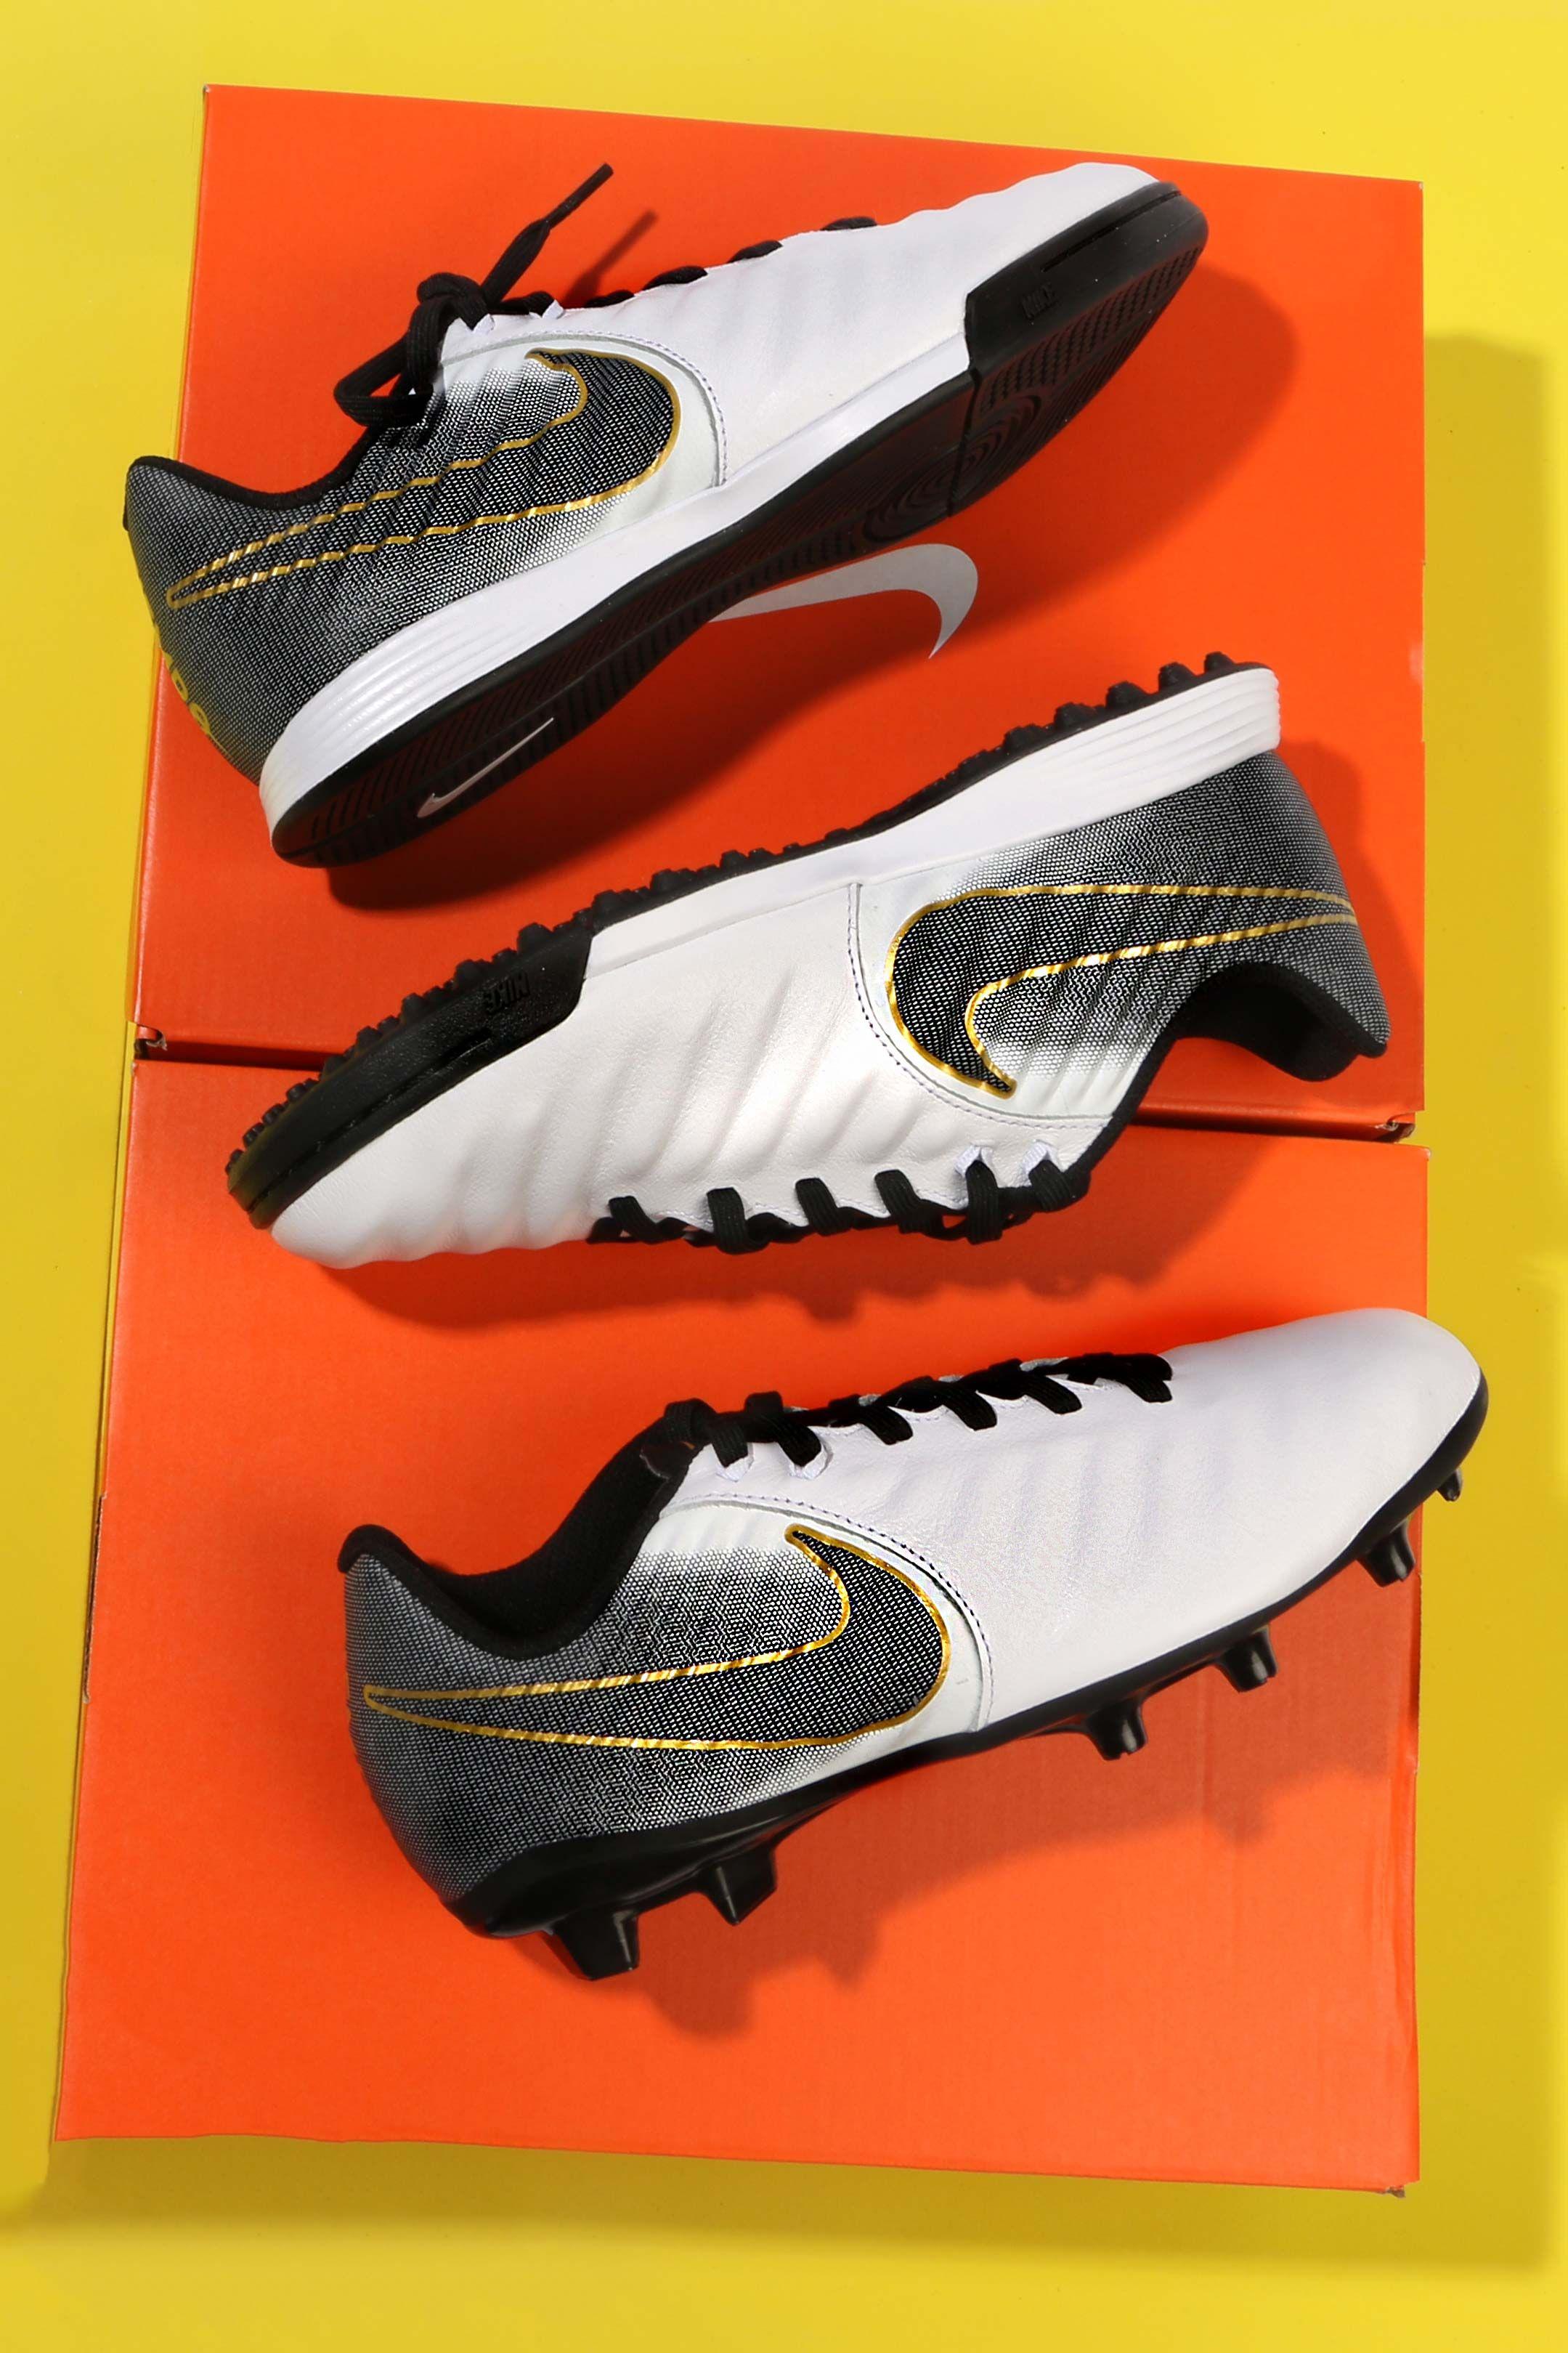 brand new 0587f 6b239 Ronaldinho, Totti, Pirlo y muchas otras leyendas usaron en su caarrera  estas botas.